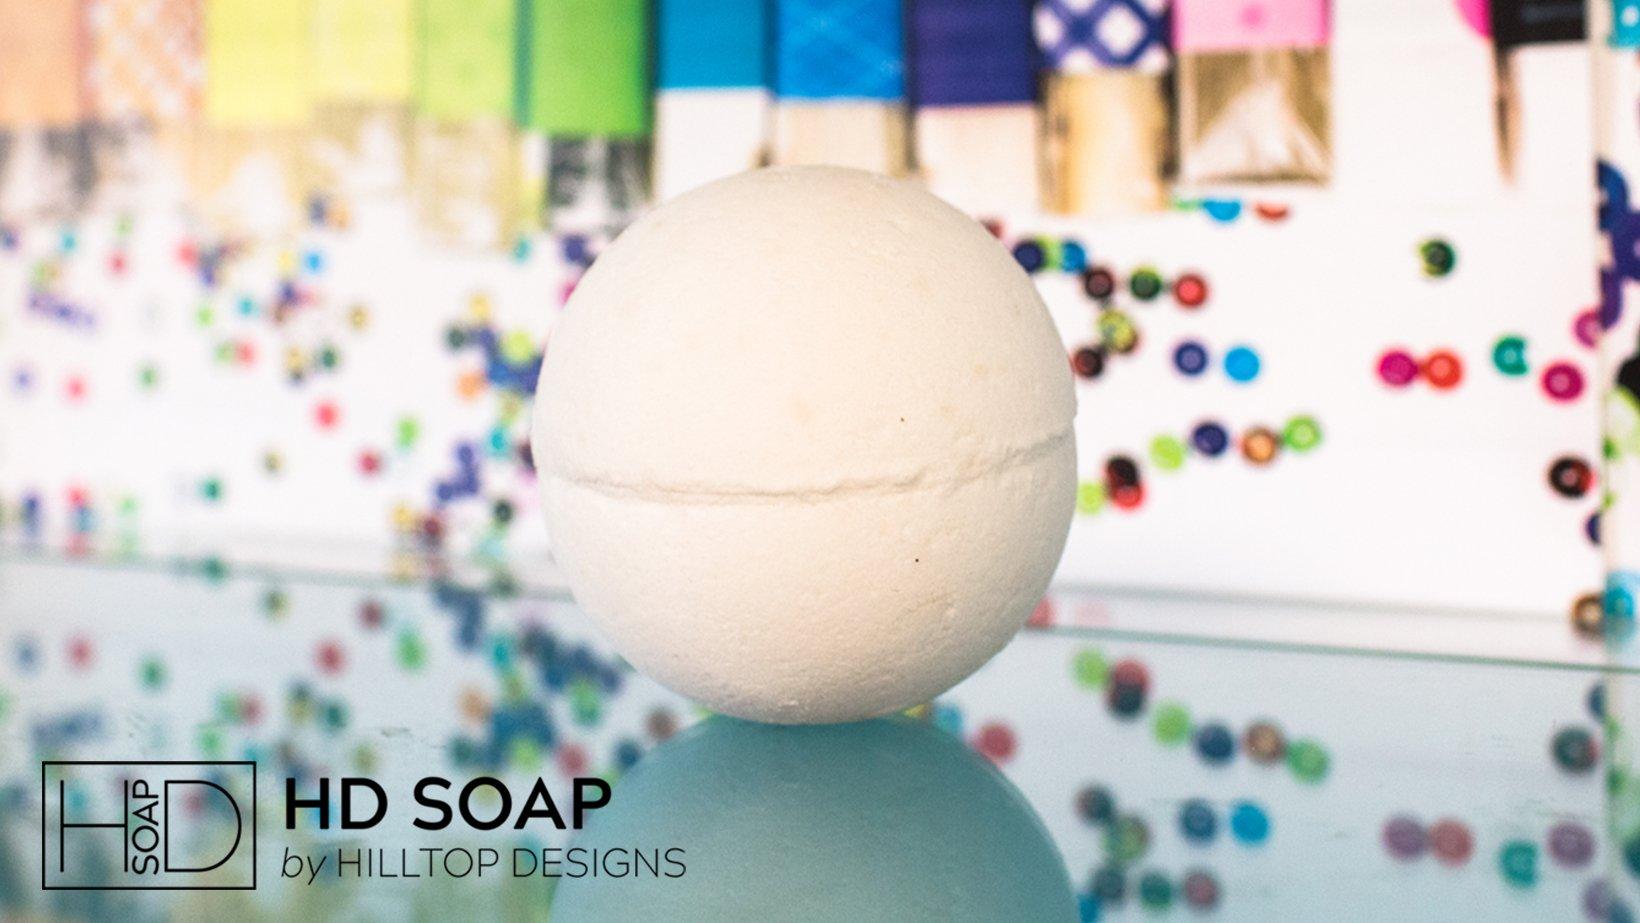 HD Soap | Bath Bomb